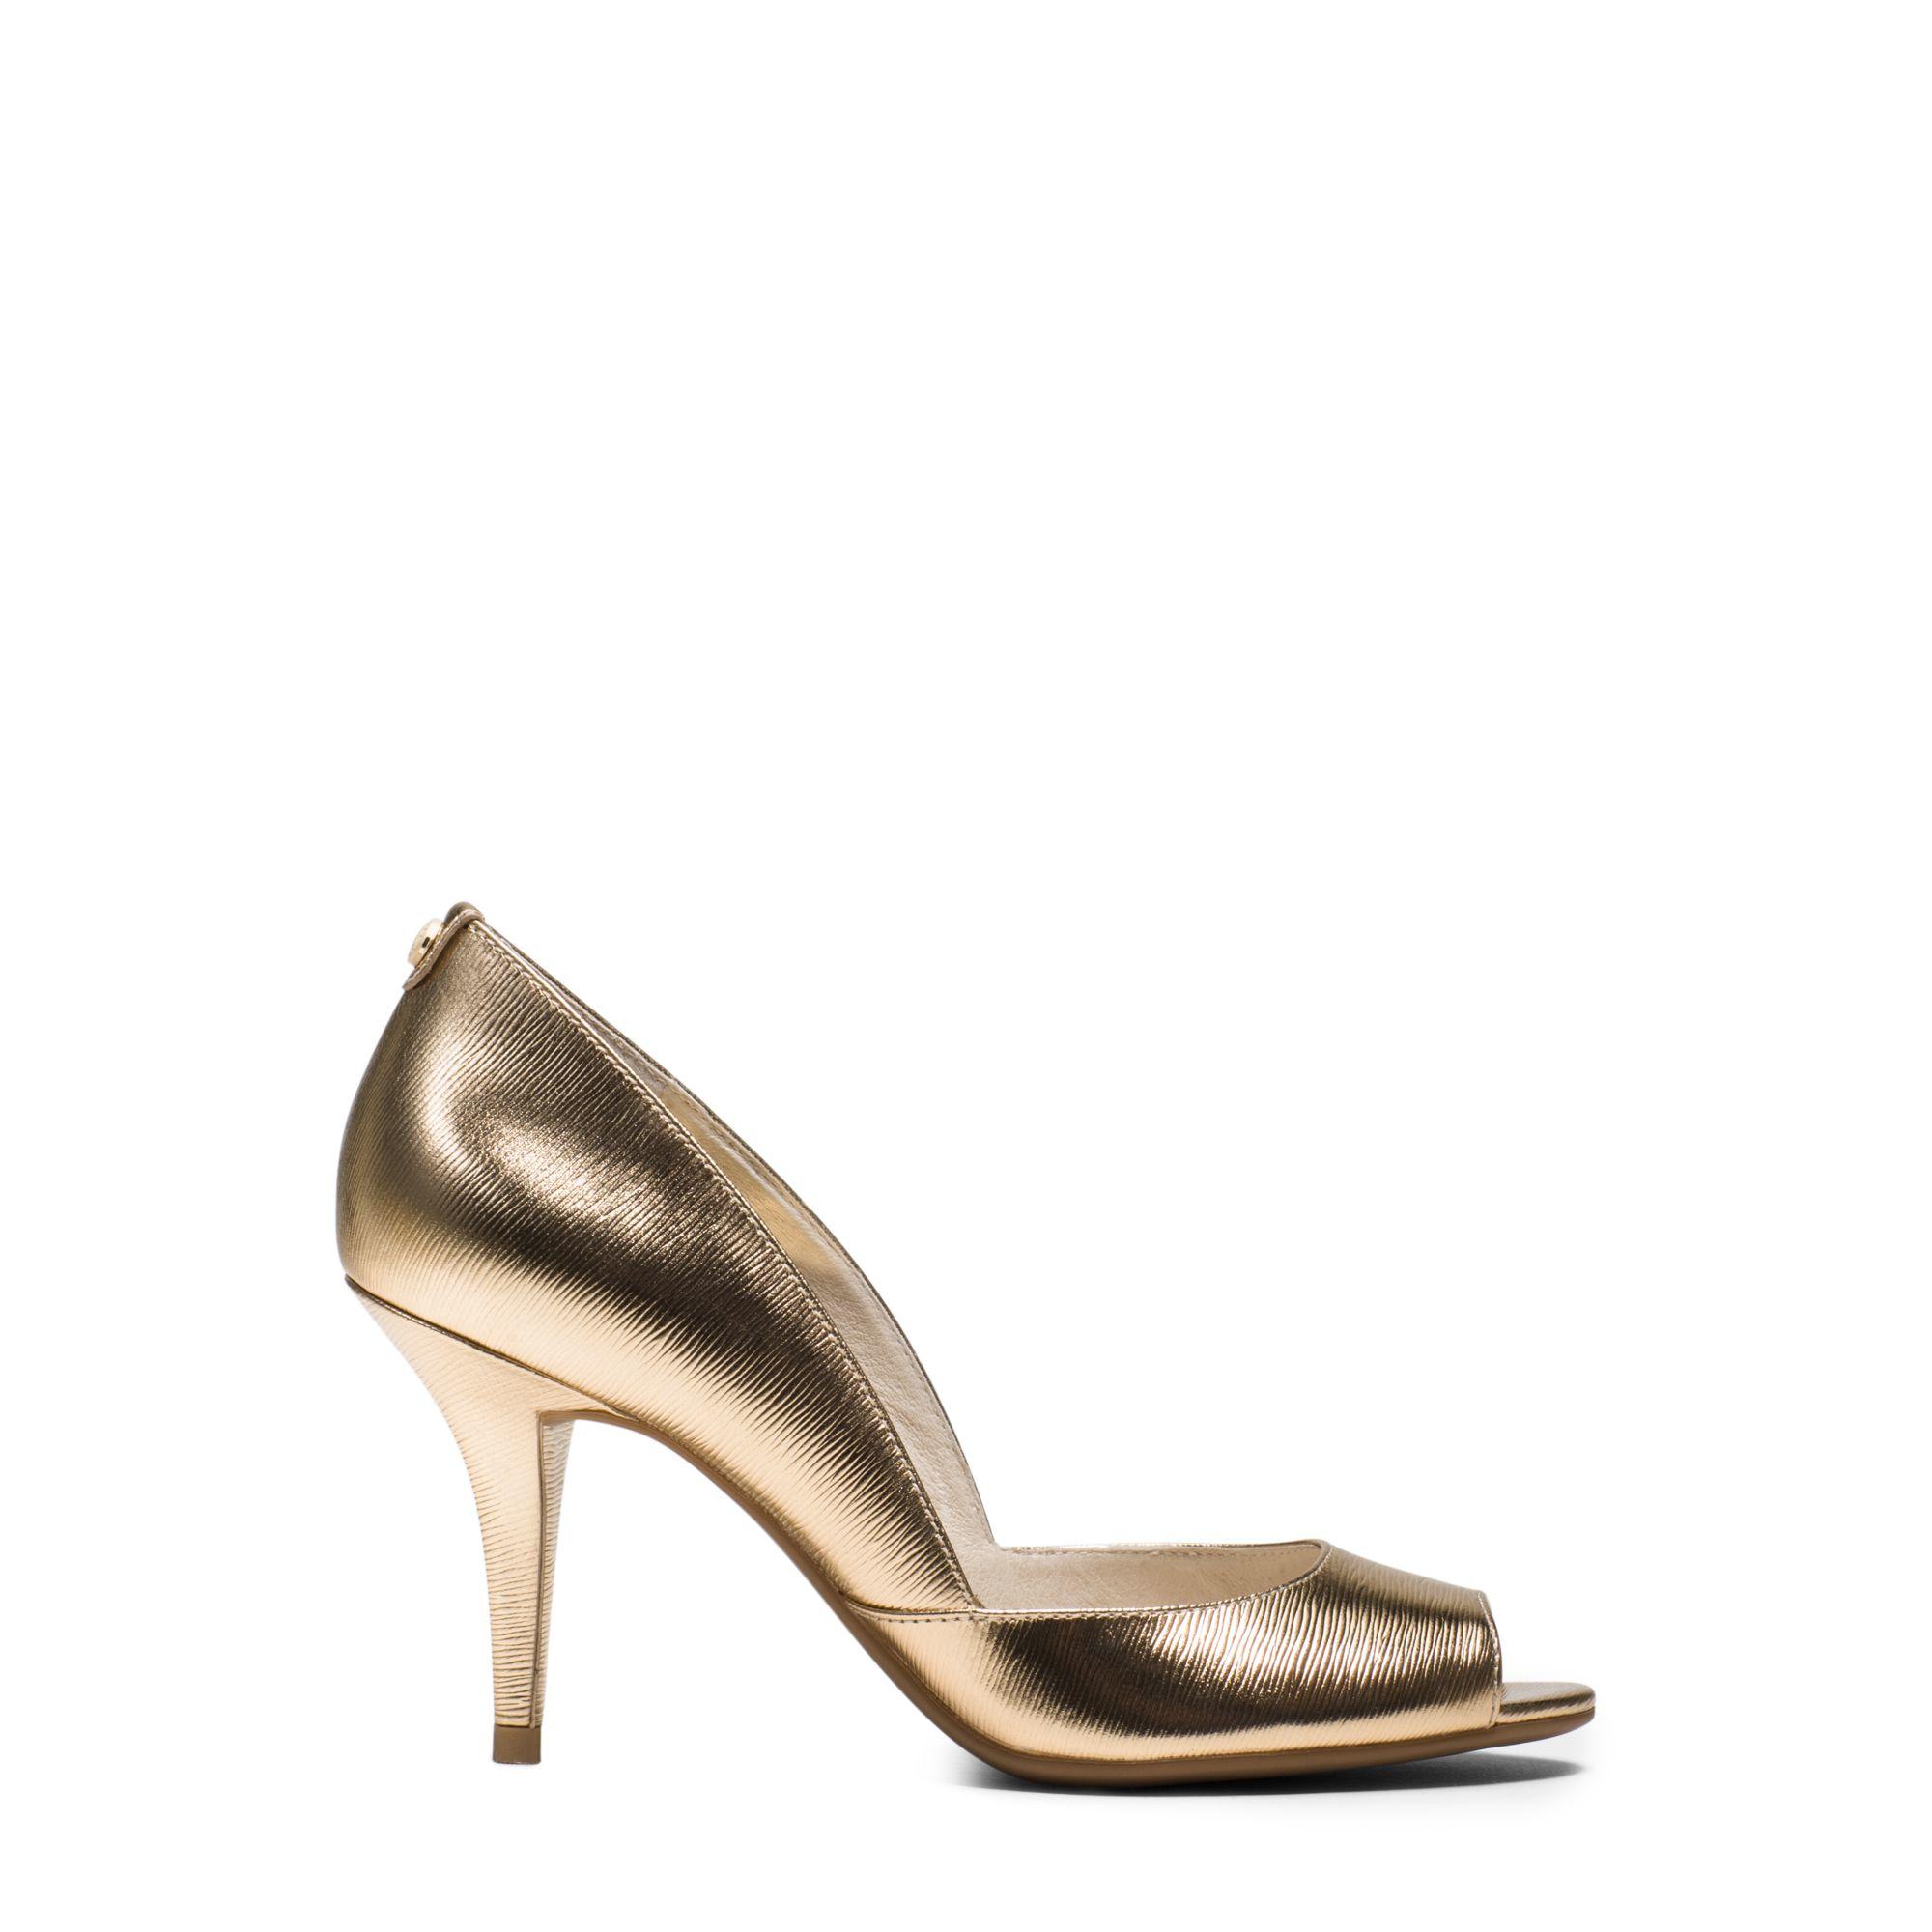 michael kors nathalie metallic leather pump in gold pale gold lyst. Black Bedroom Furniture Sets. Home Design Ideas